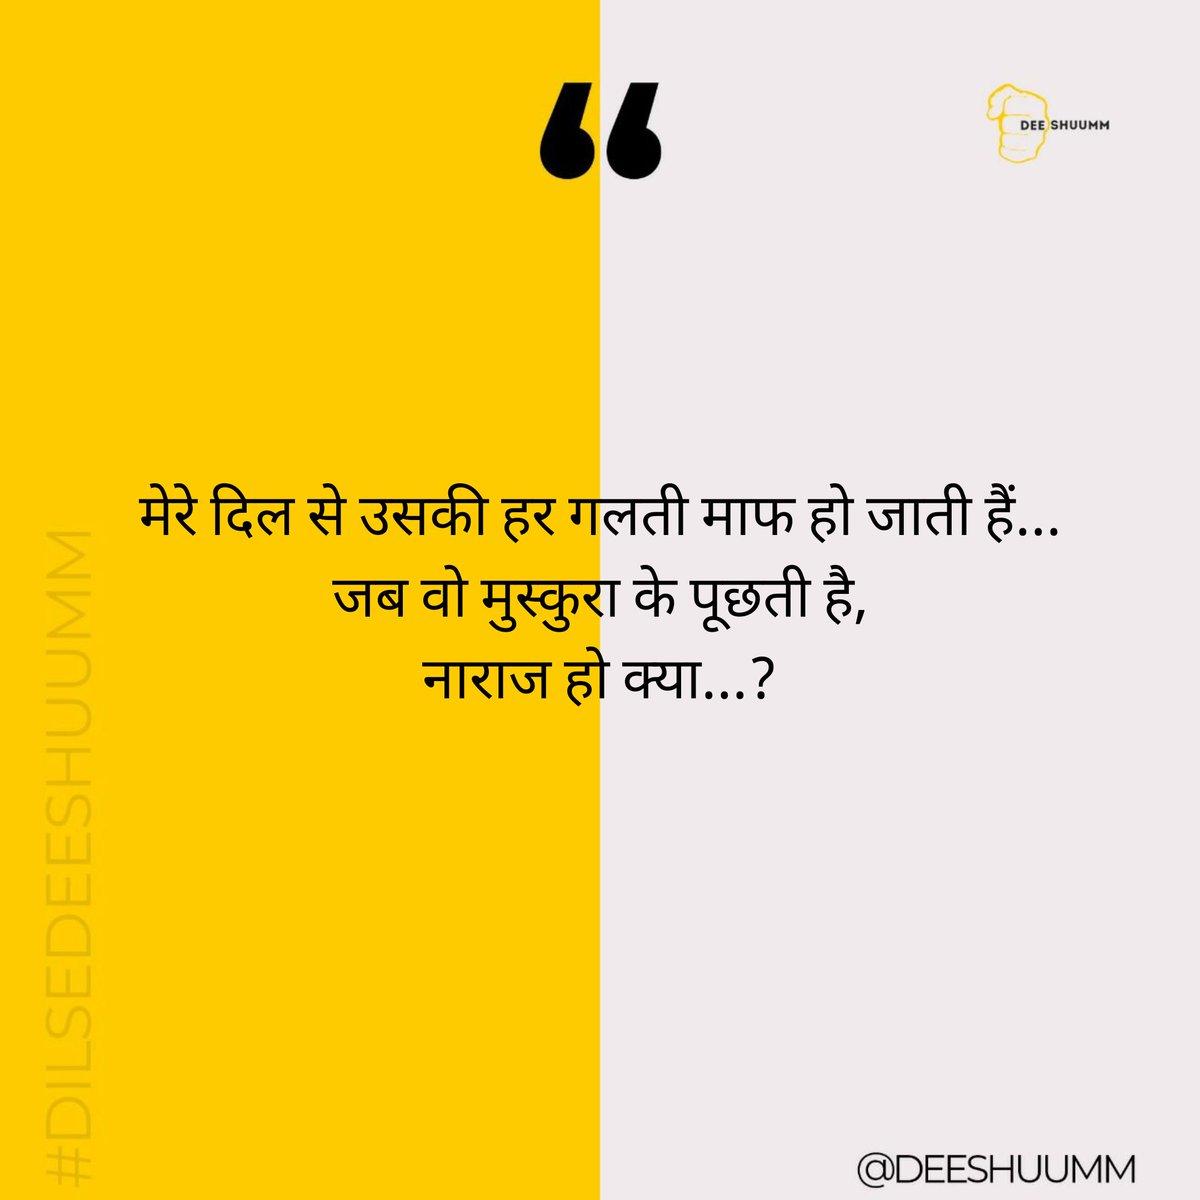 if you feel Connected RT Now! #shayari #love #poetry #urdu #urdupoetry #shayarilover #hindi #shayar #quotes #hindishayari #lovequotes #rekhta #follow #urdushayari #loveshayari #hindipoetry #ishq #poet #like  #shayri #poetrycommunity #instashayari #sad #poem #mohabbat #deeshuummpic.twitter.com/rGvICMdXHd